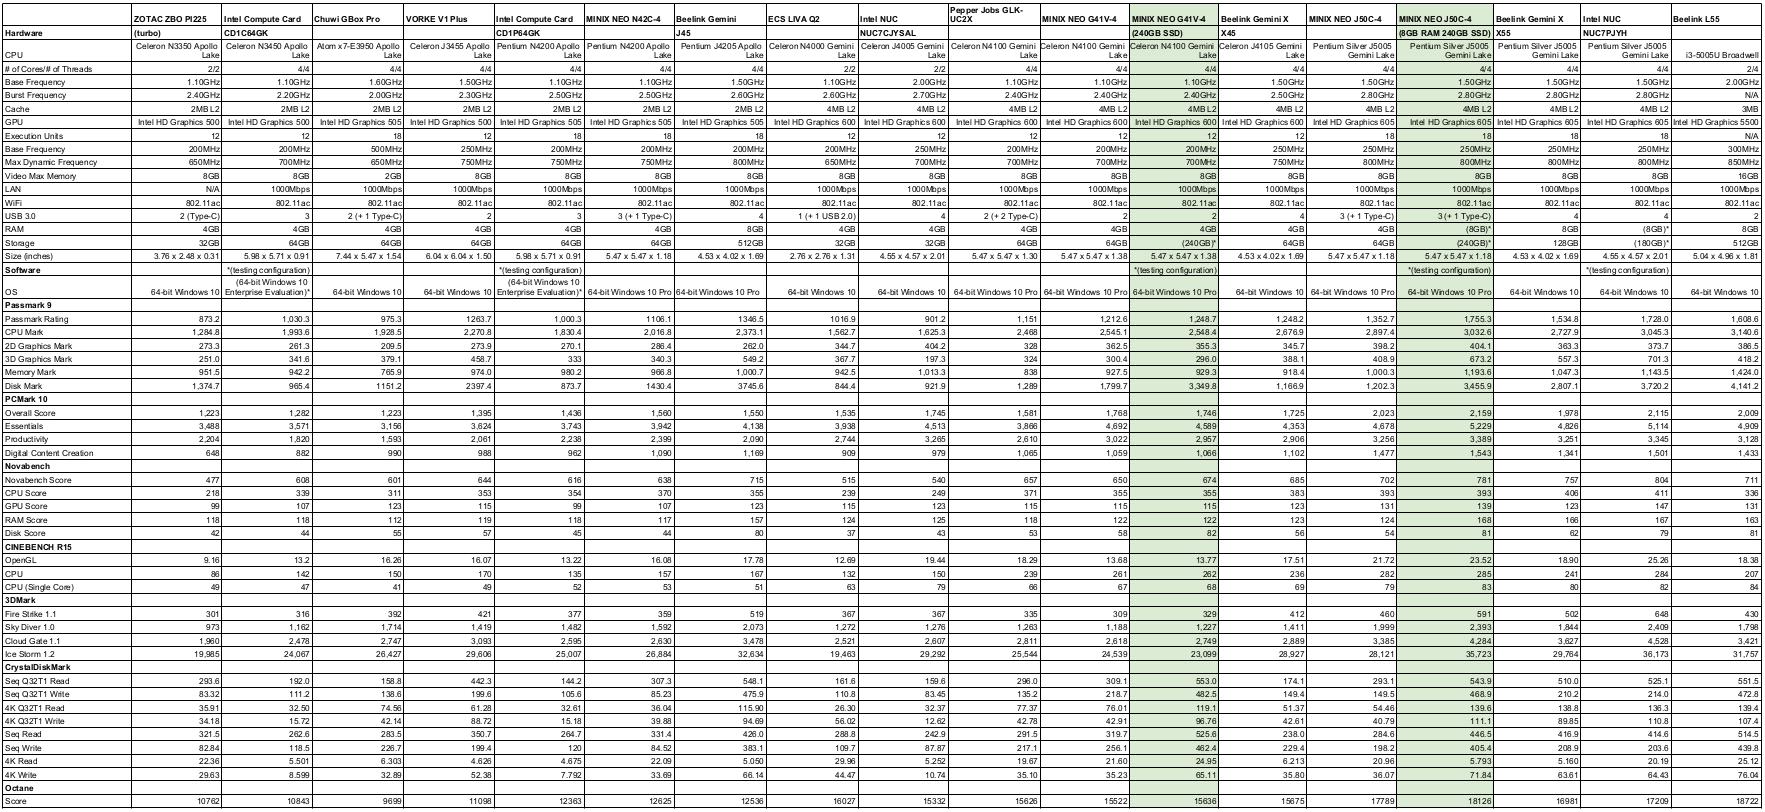 MINIX NEO G41V-4 vs NEO-J50C-4 Benchmarks